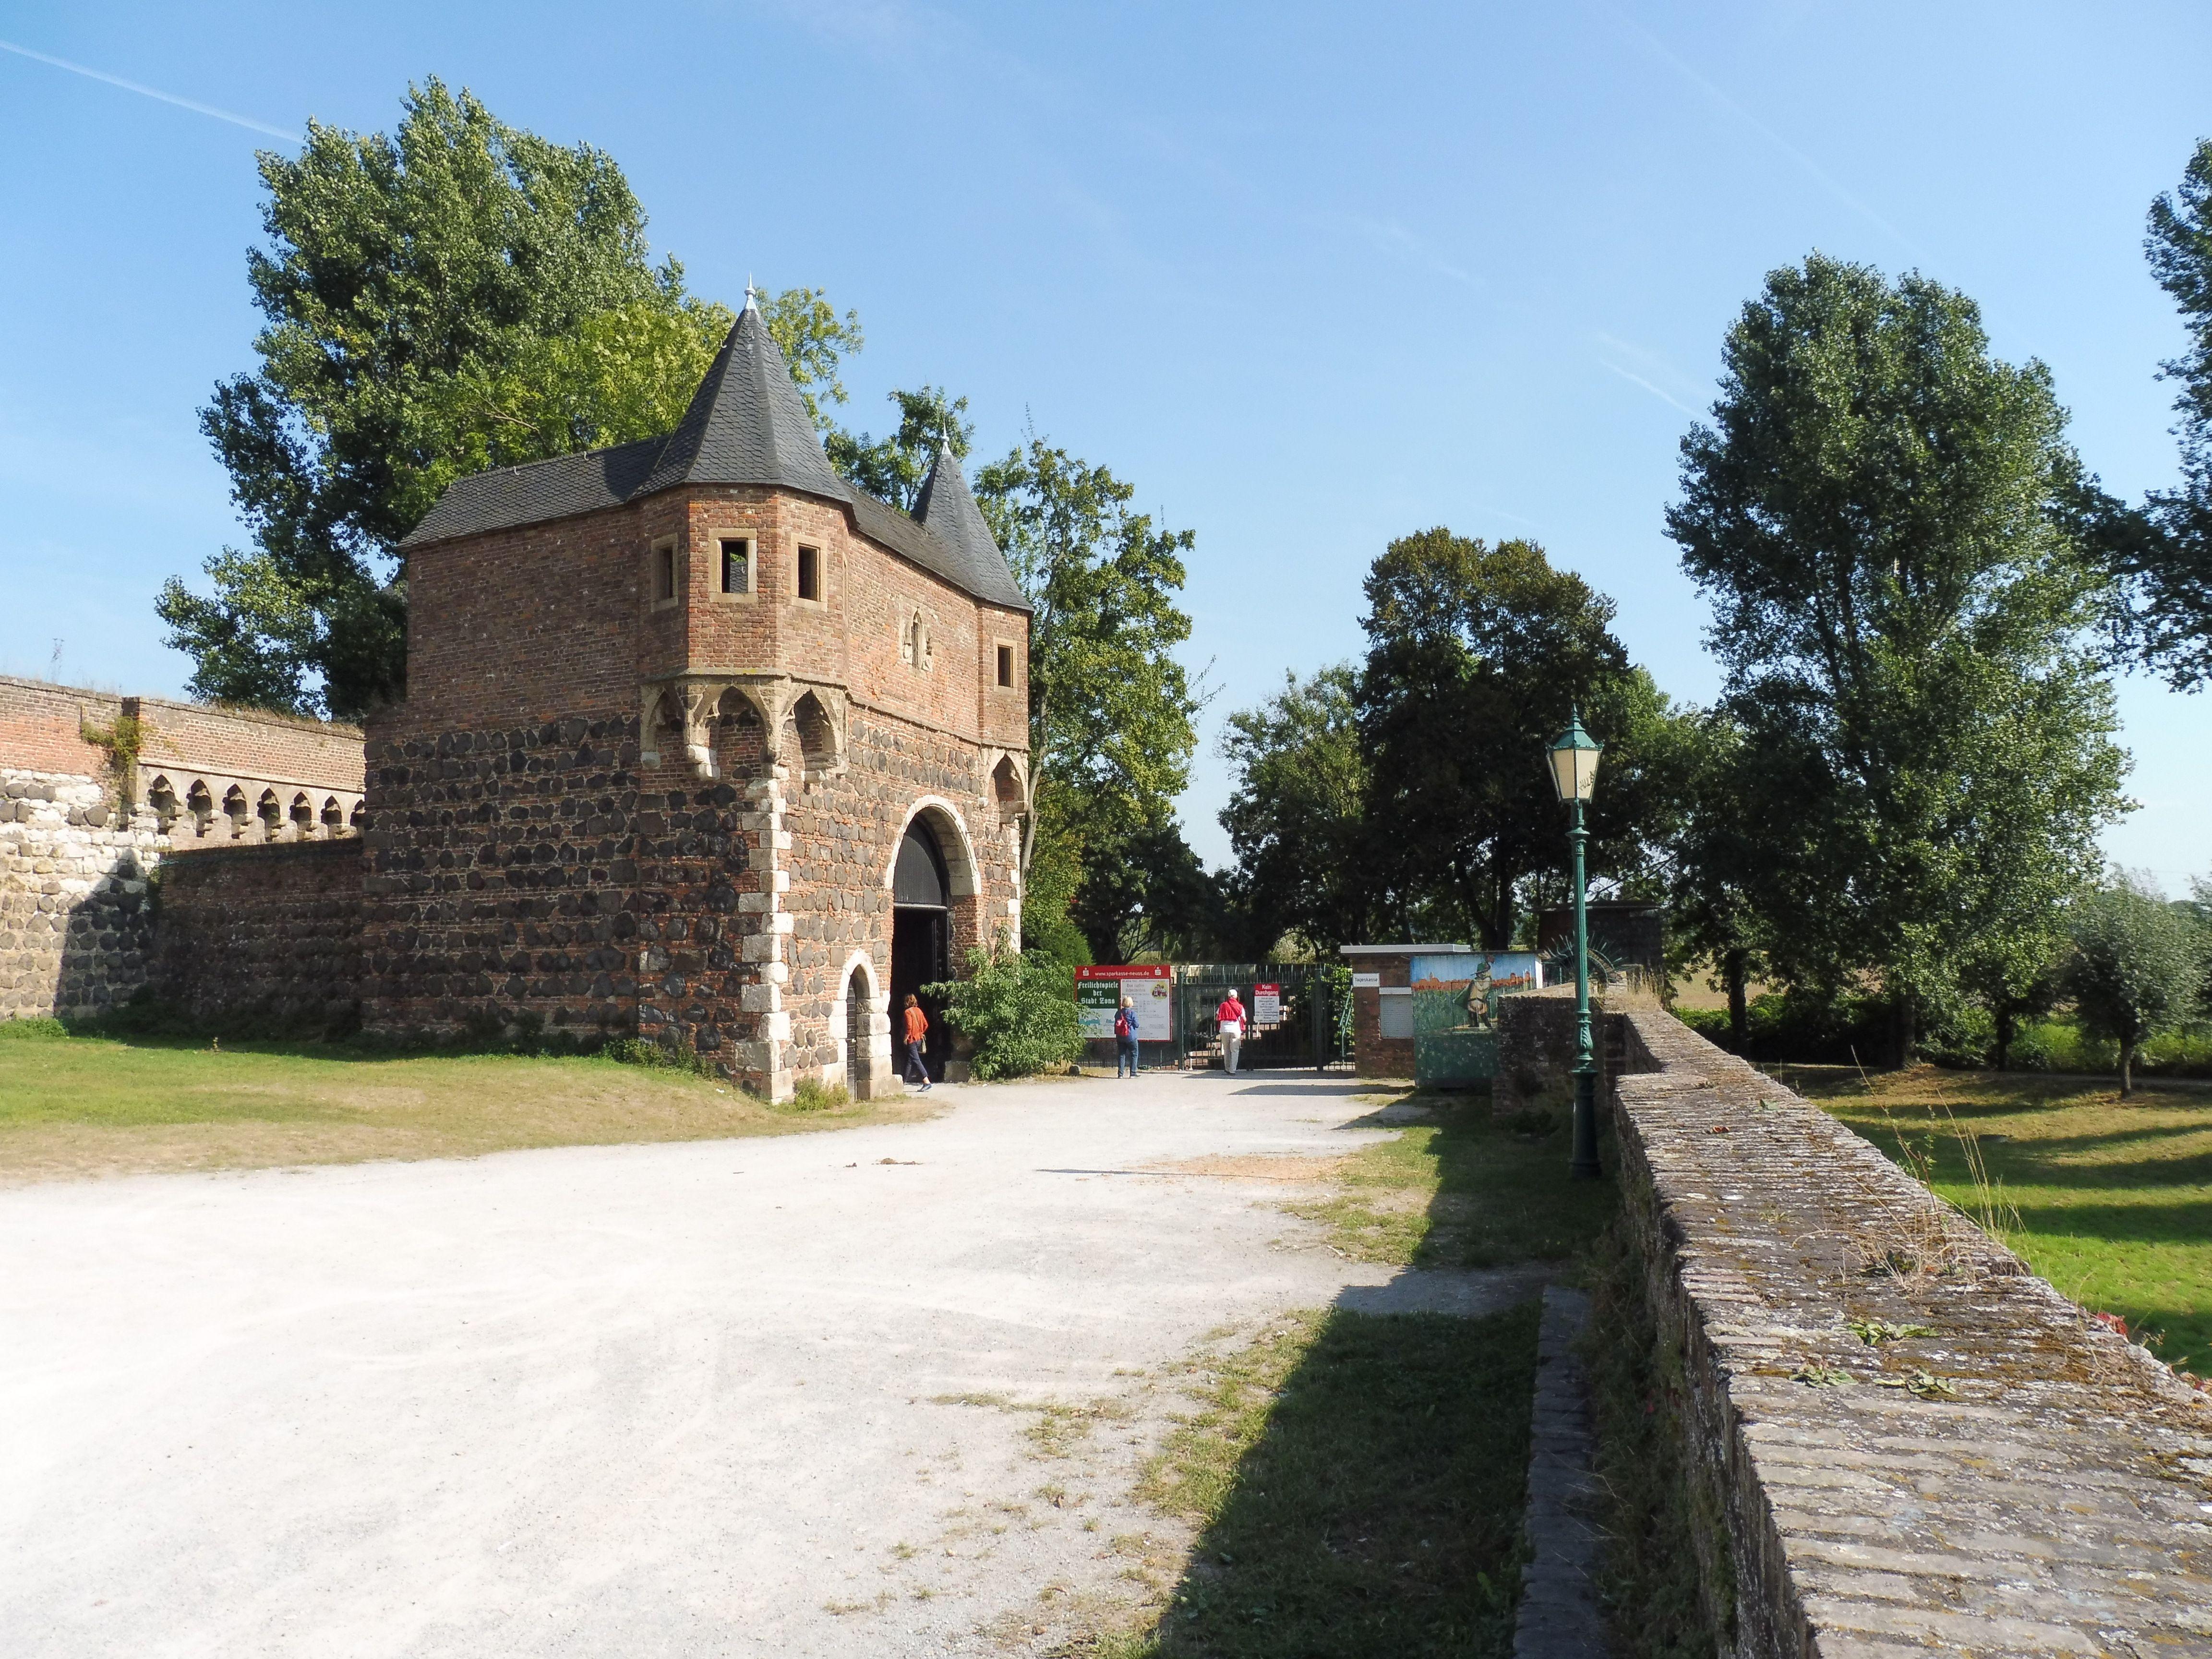 Zons Fortificación